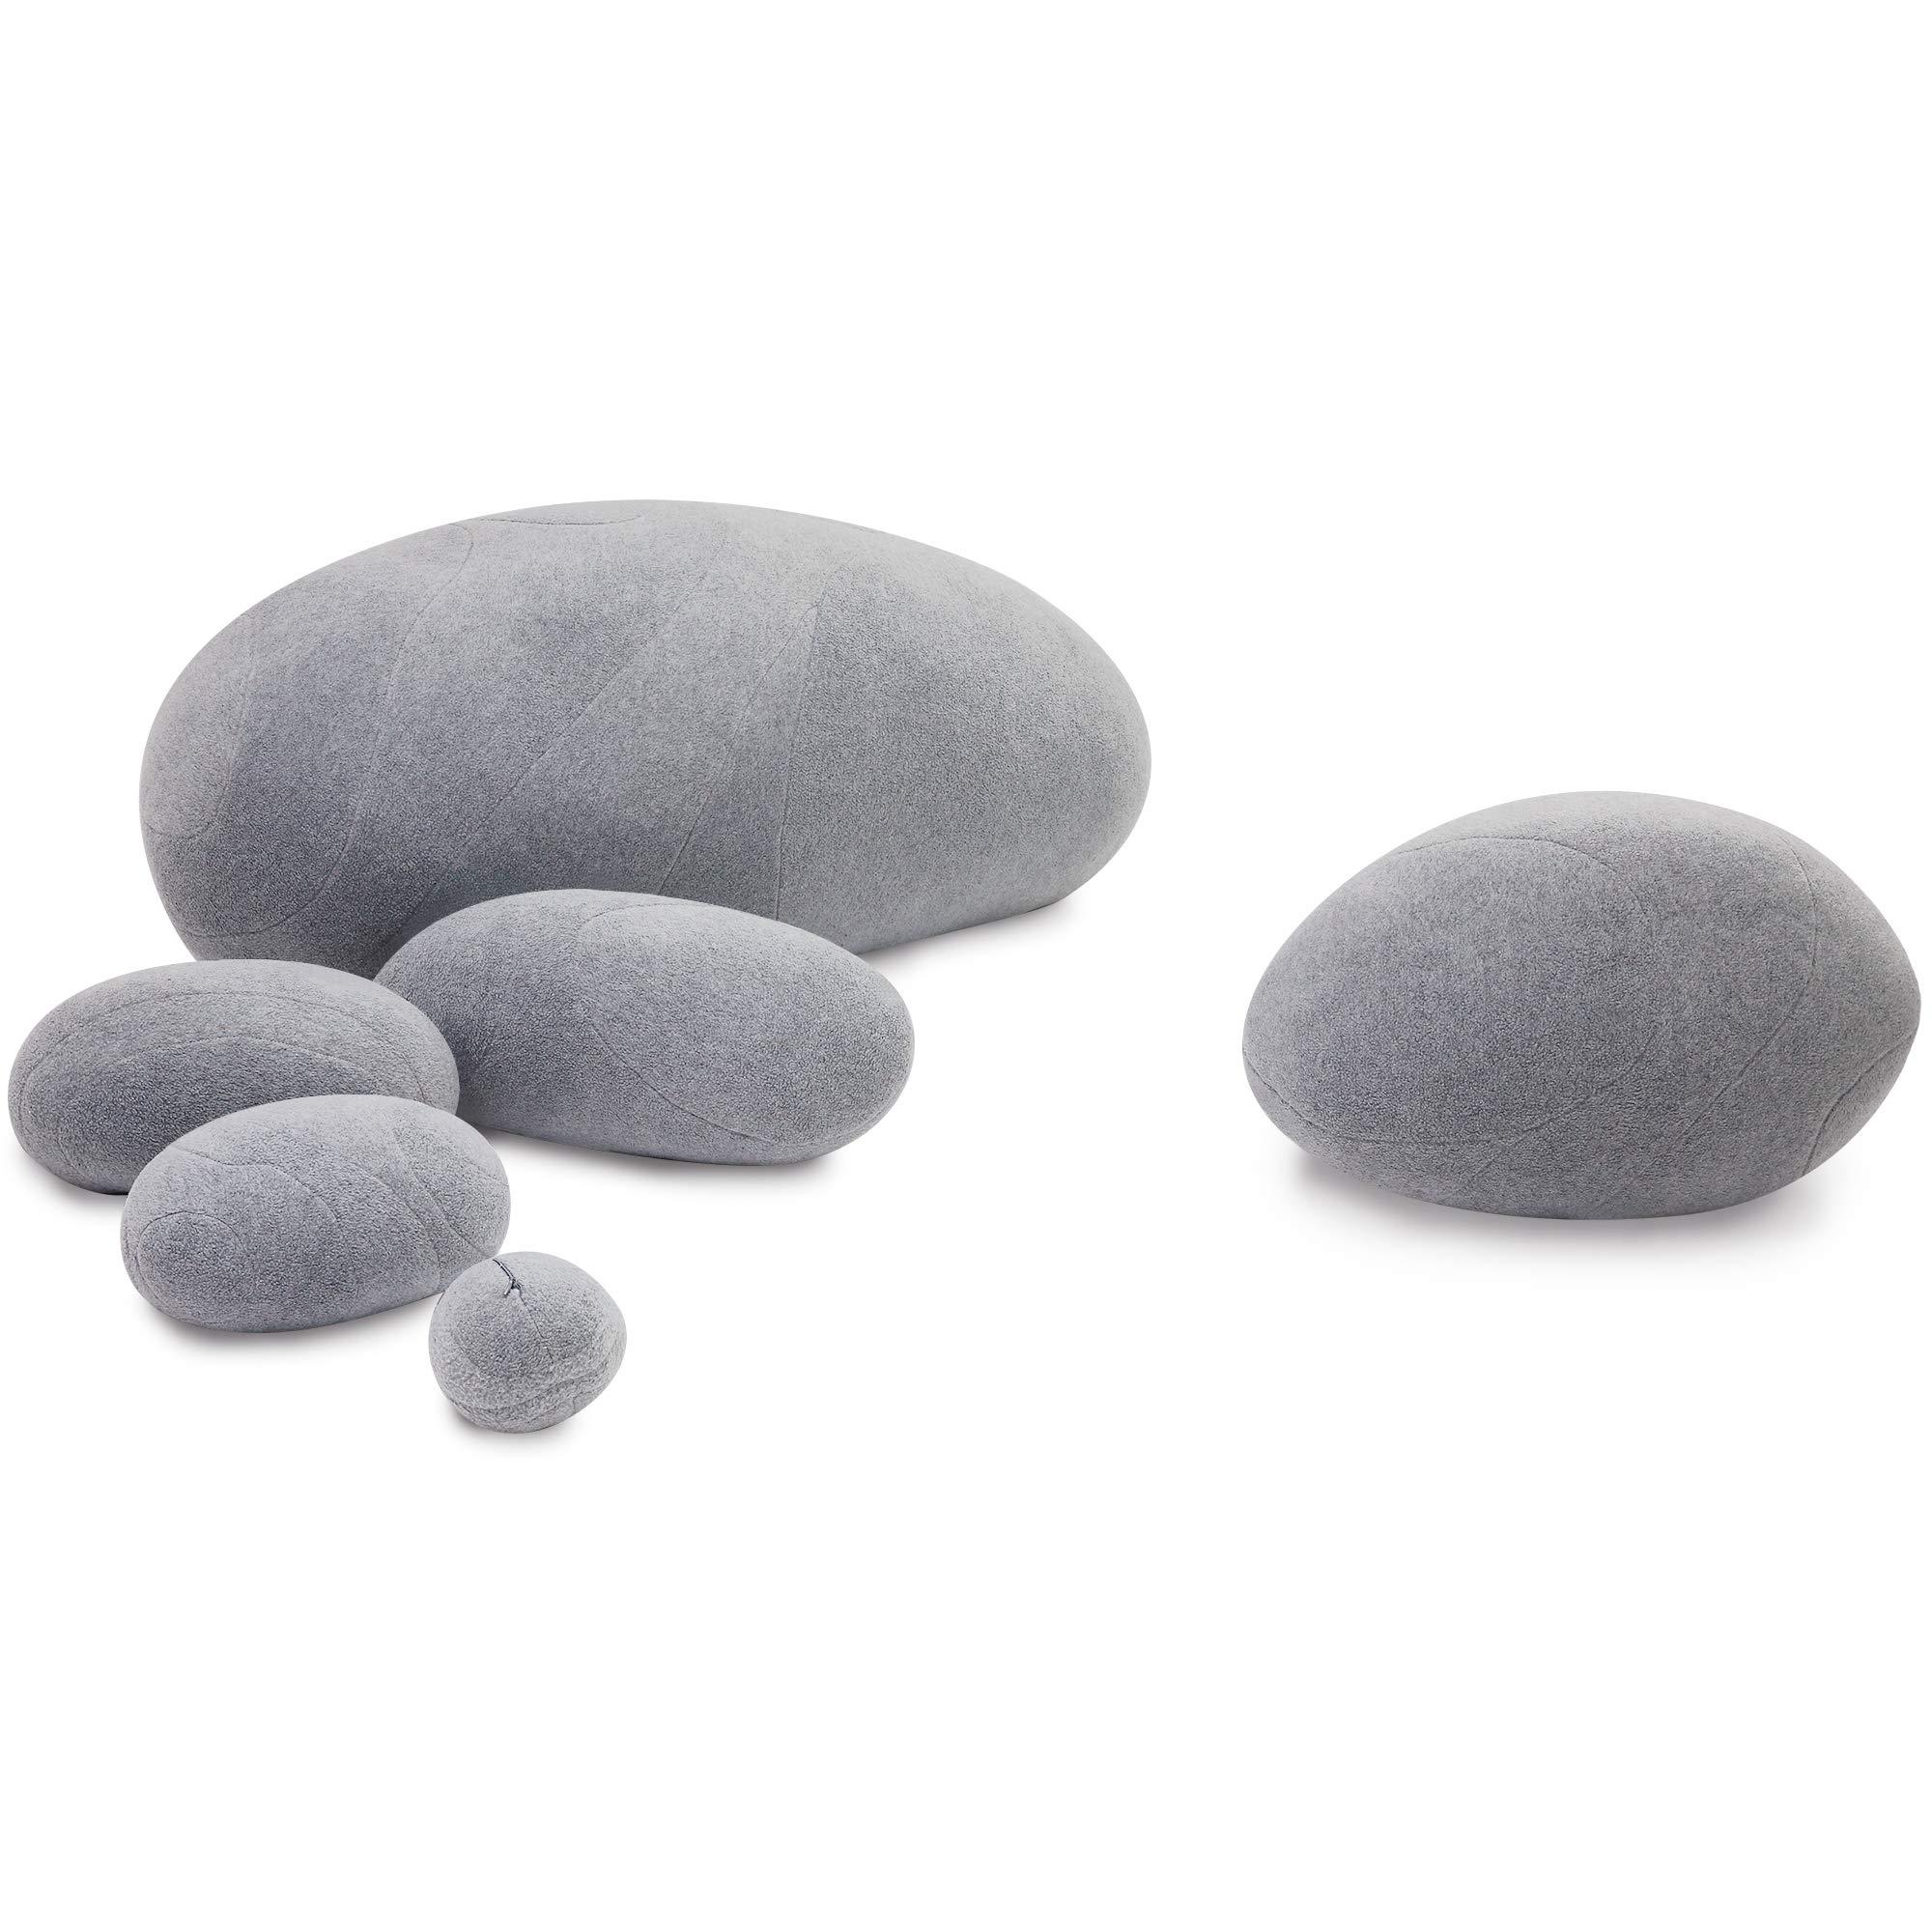 YXCSELL Three-Dimensional Huge Living Rocks Stones Pillows 6 Mix Sizes Stuffed Pillows Big Rock Pillows New Pebble Pillows (Light Grey)